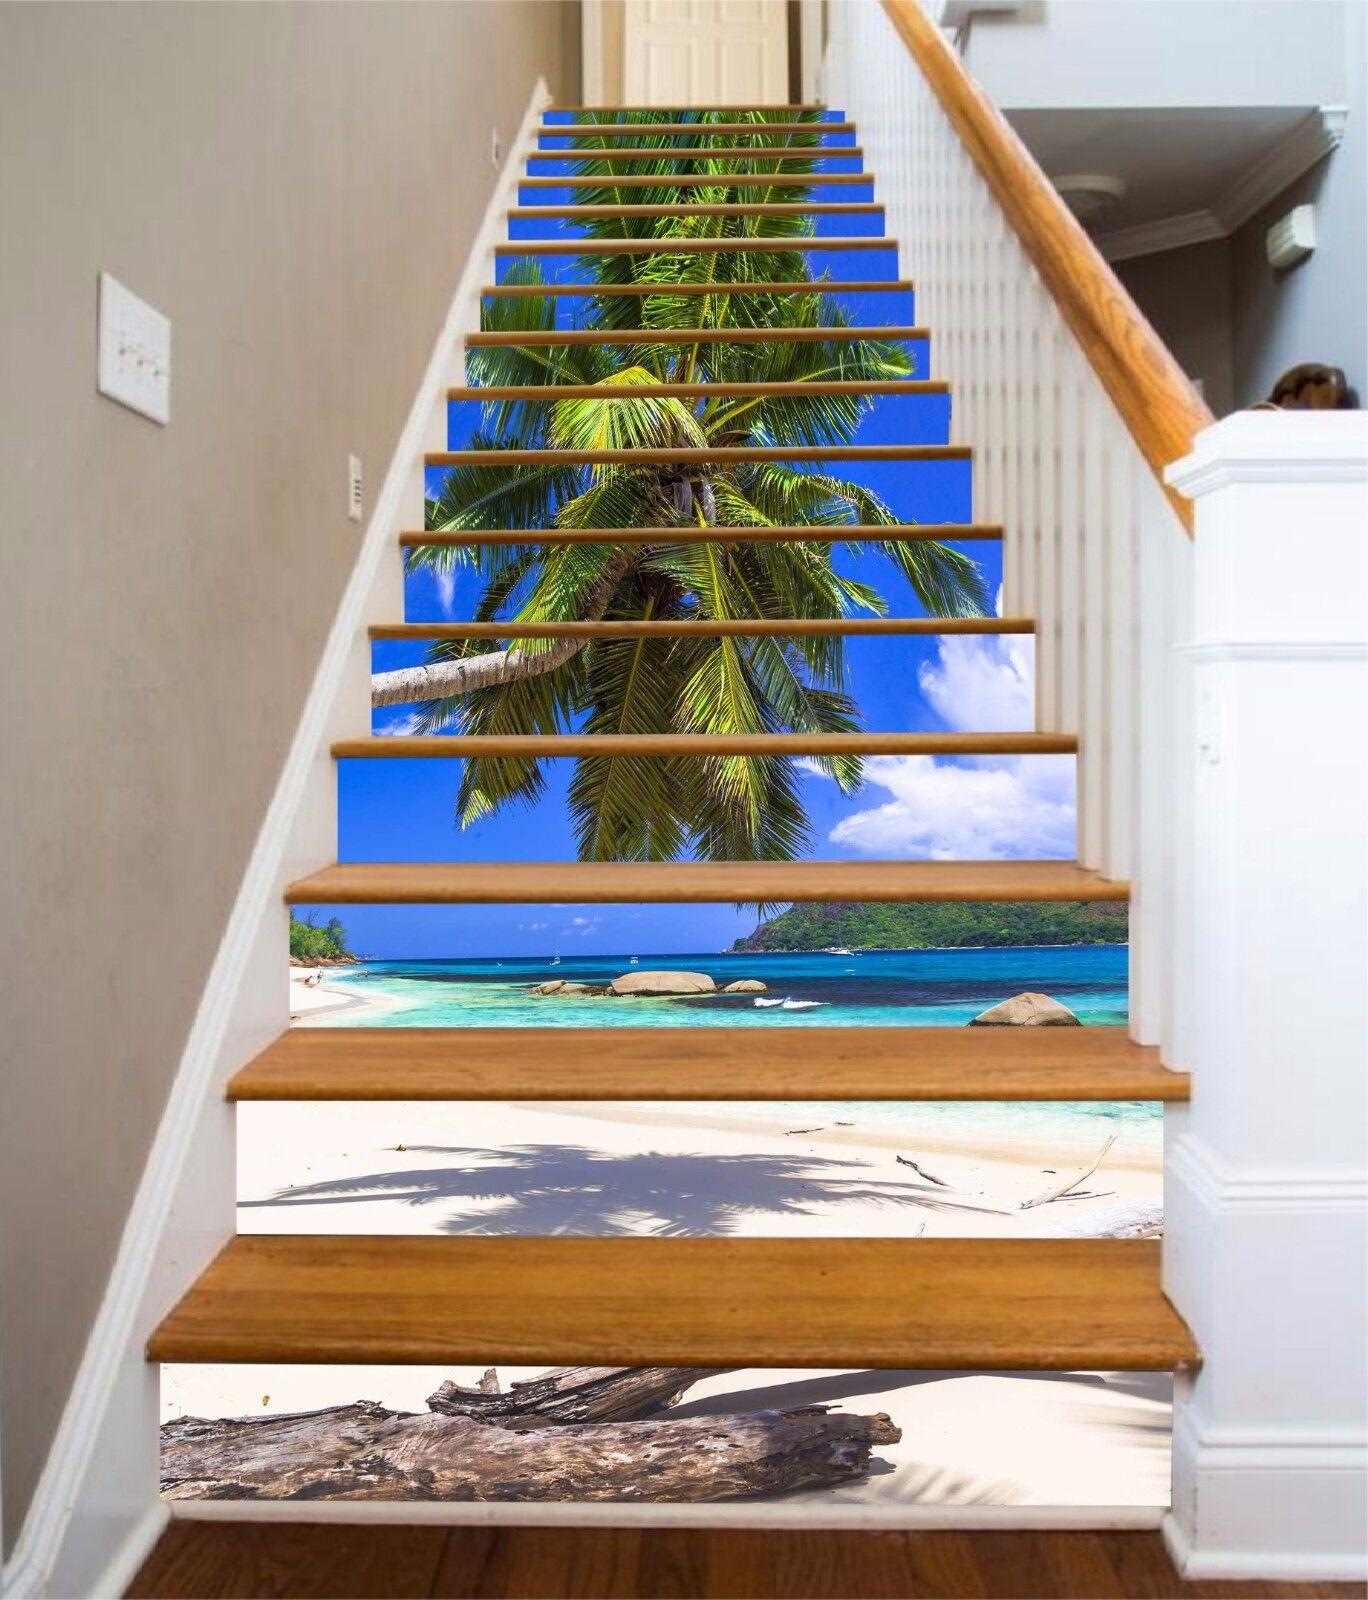 3D Palm Beach 35 Stair Risers Decoration Photo Mural Vinyl Decal Wallpaper UK